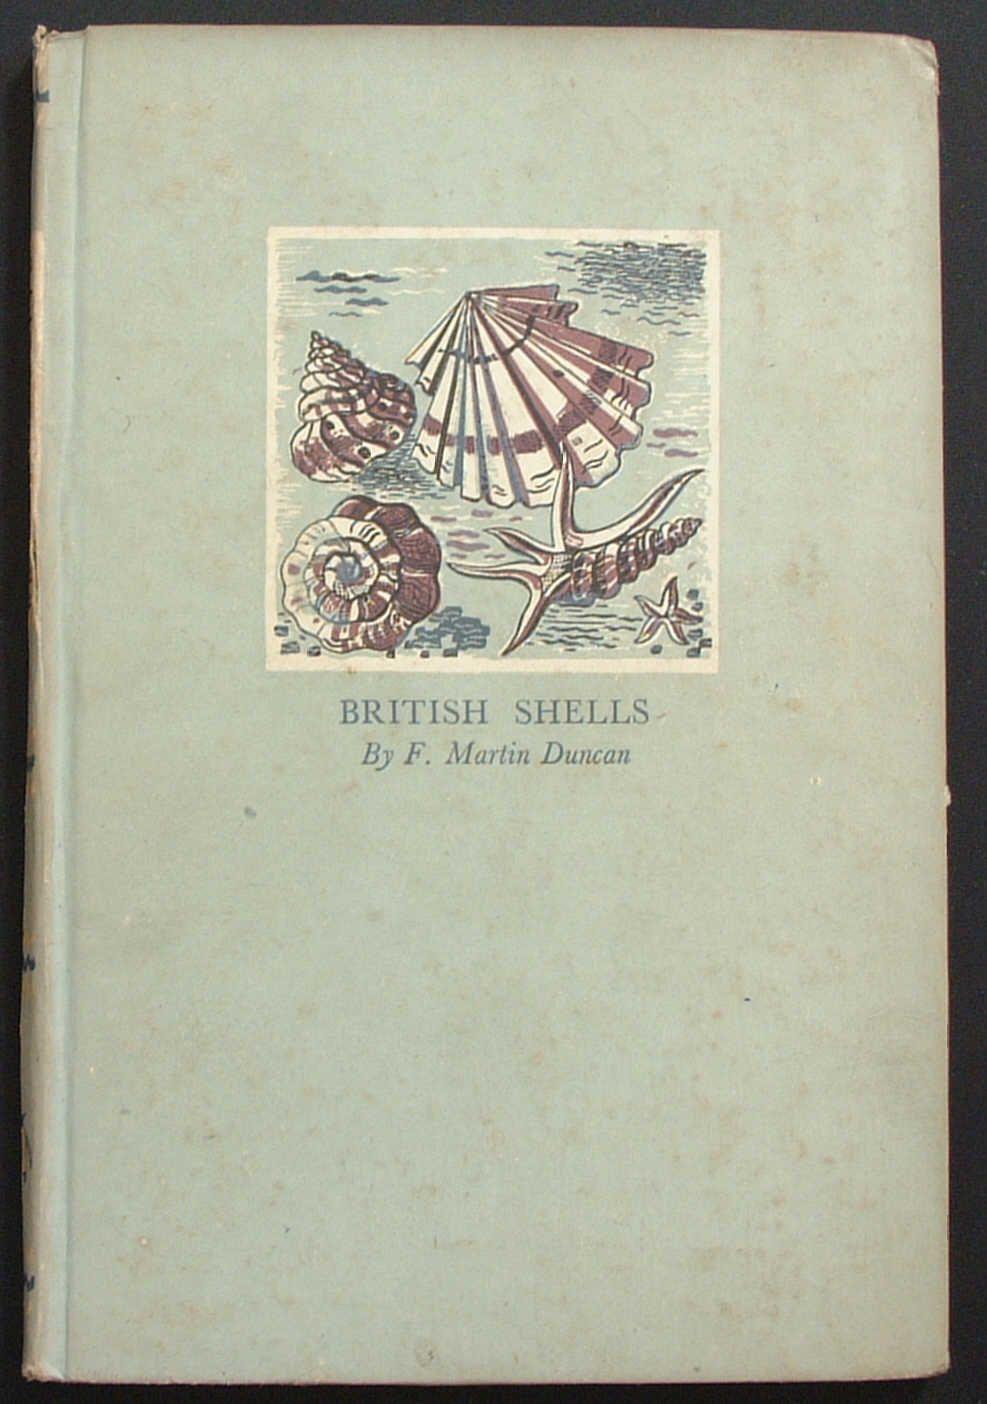 Series No.: K6 Title: BRITISH SHELLS Author: F. Martin Duncan Date Published: June 1943